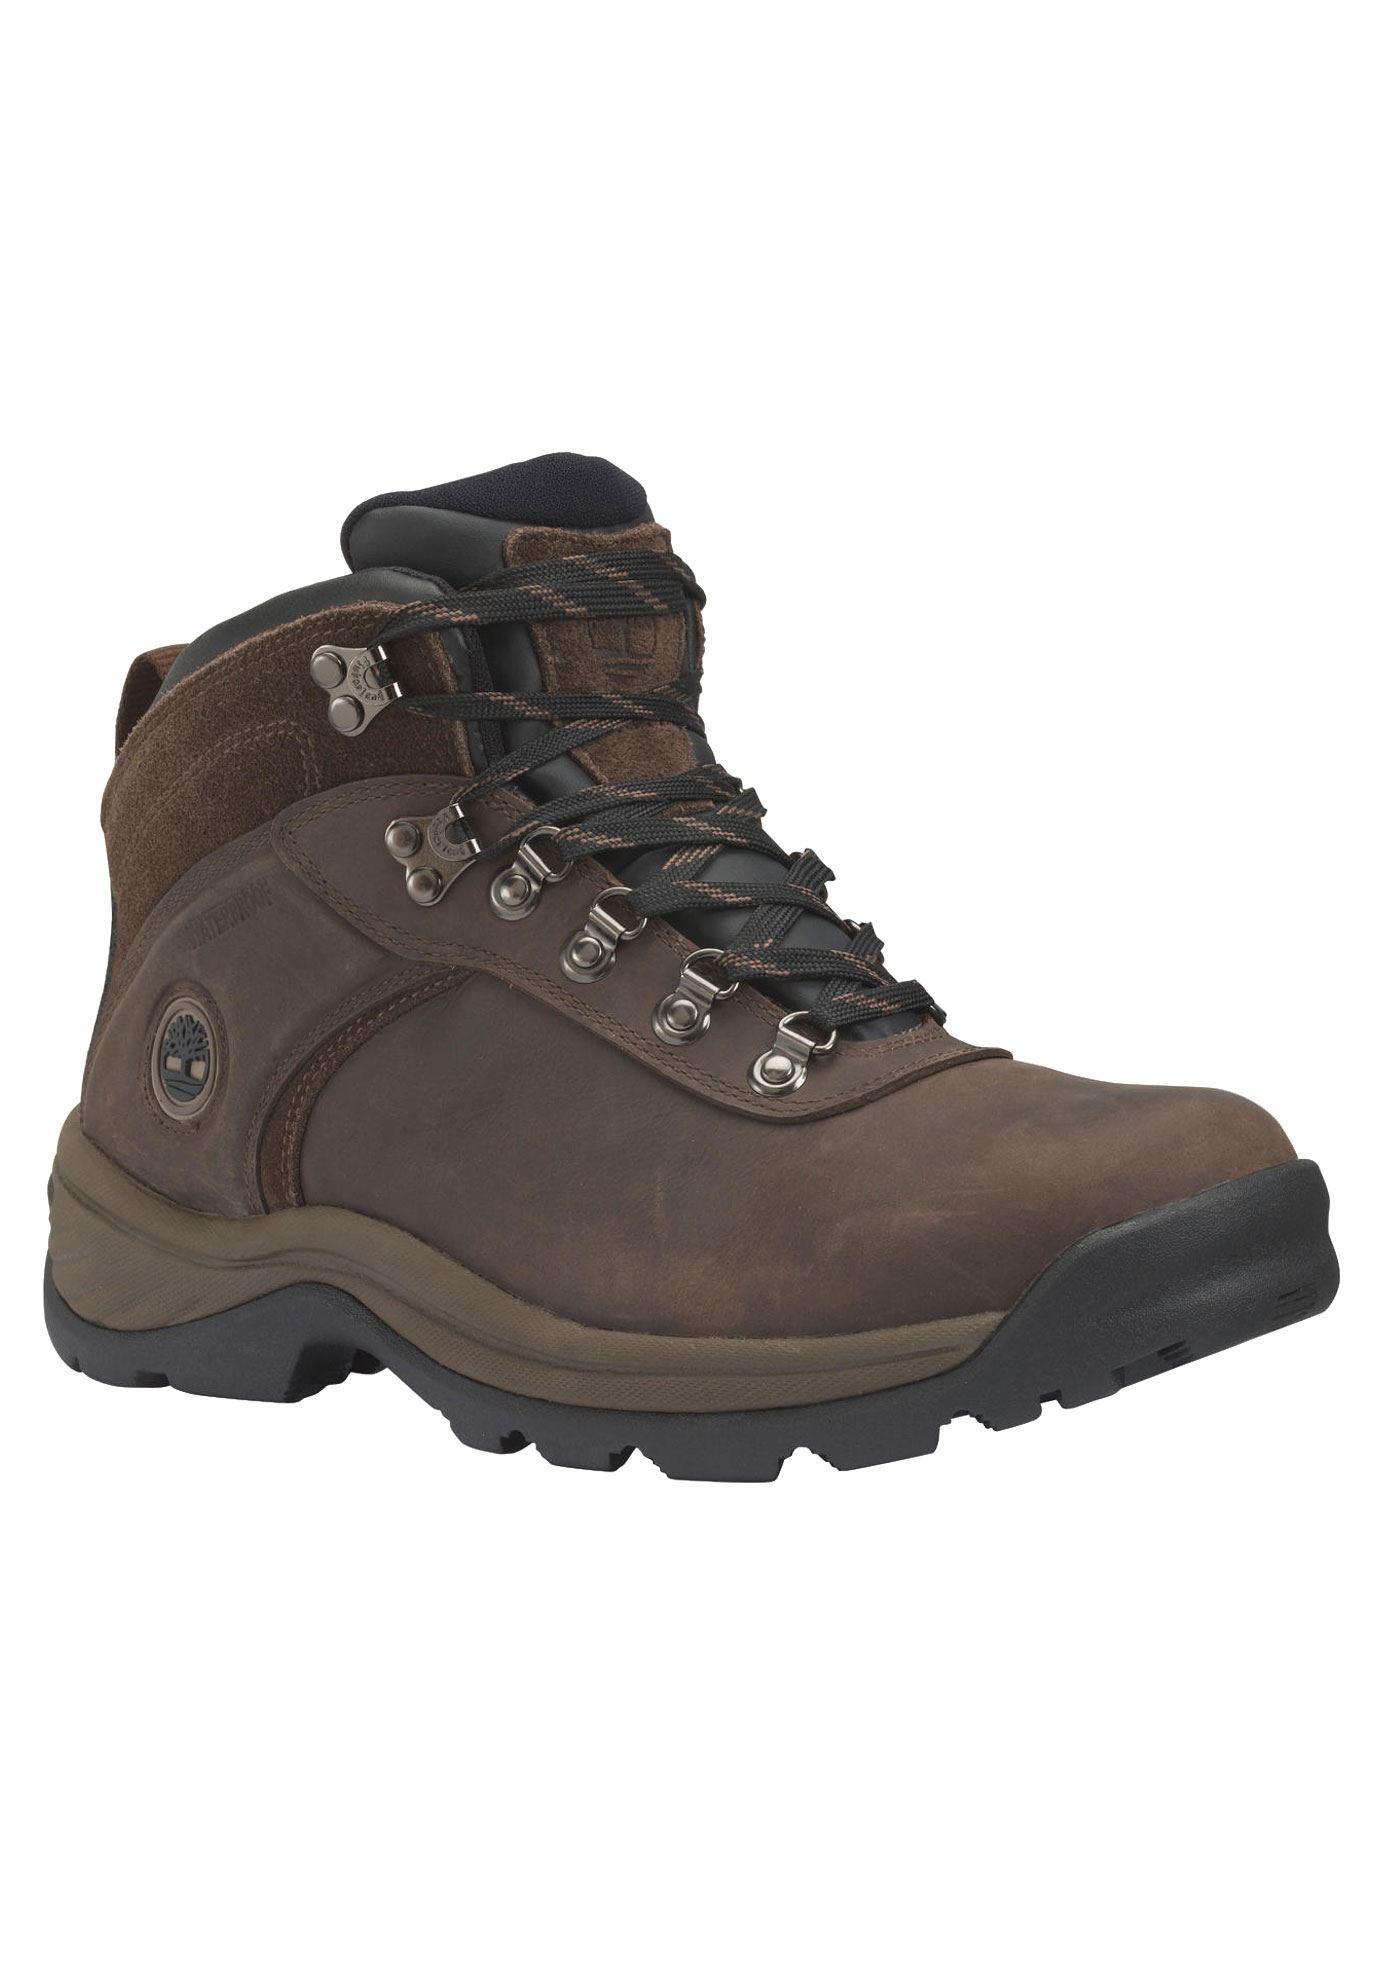 34ac78da58 Timberland® Flume Mid Waterproof Boots